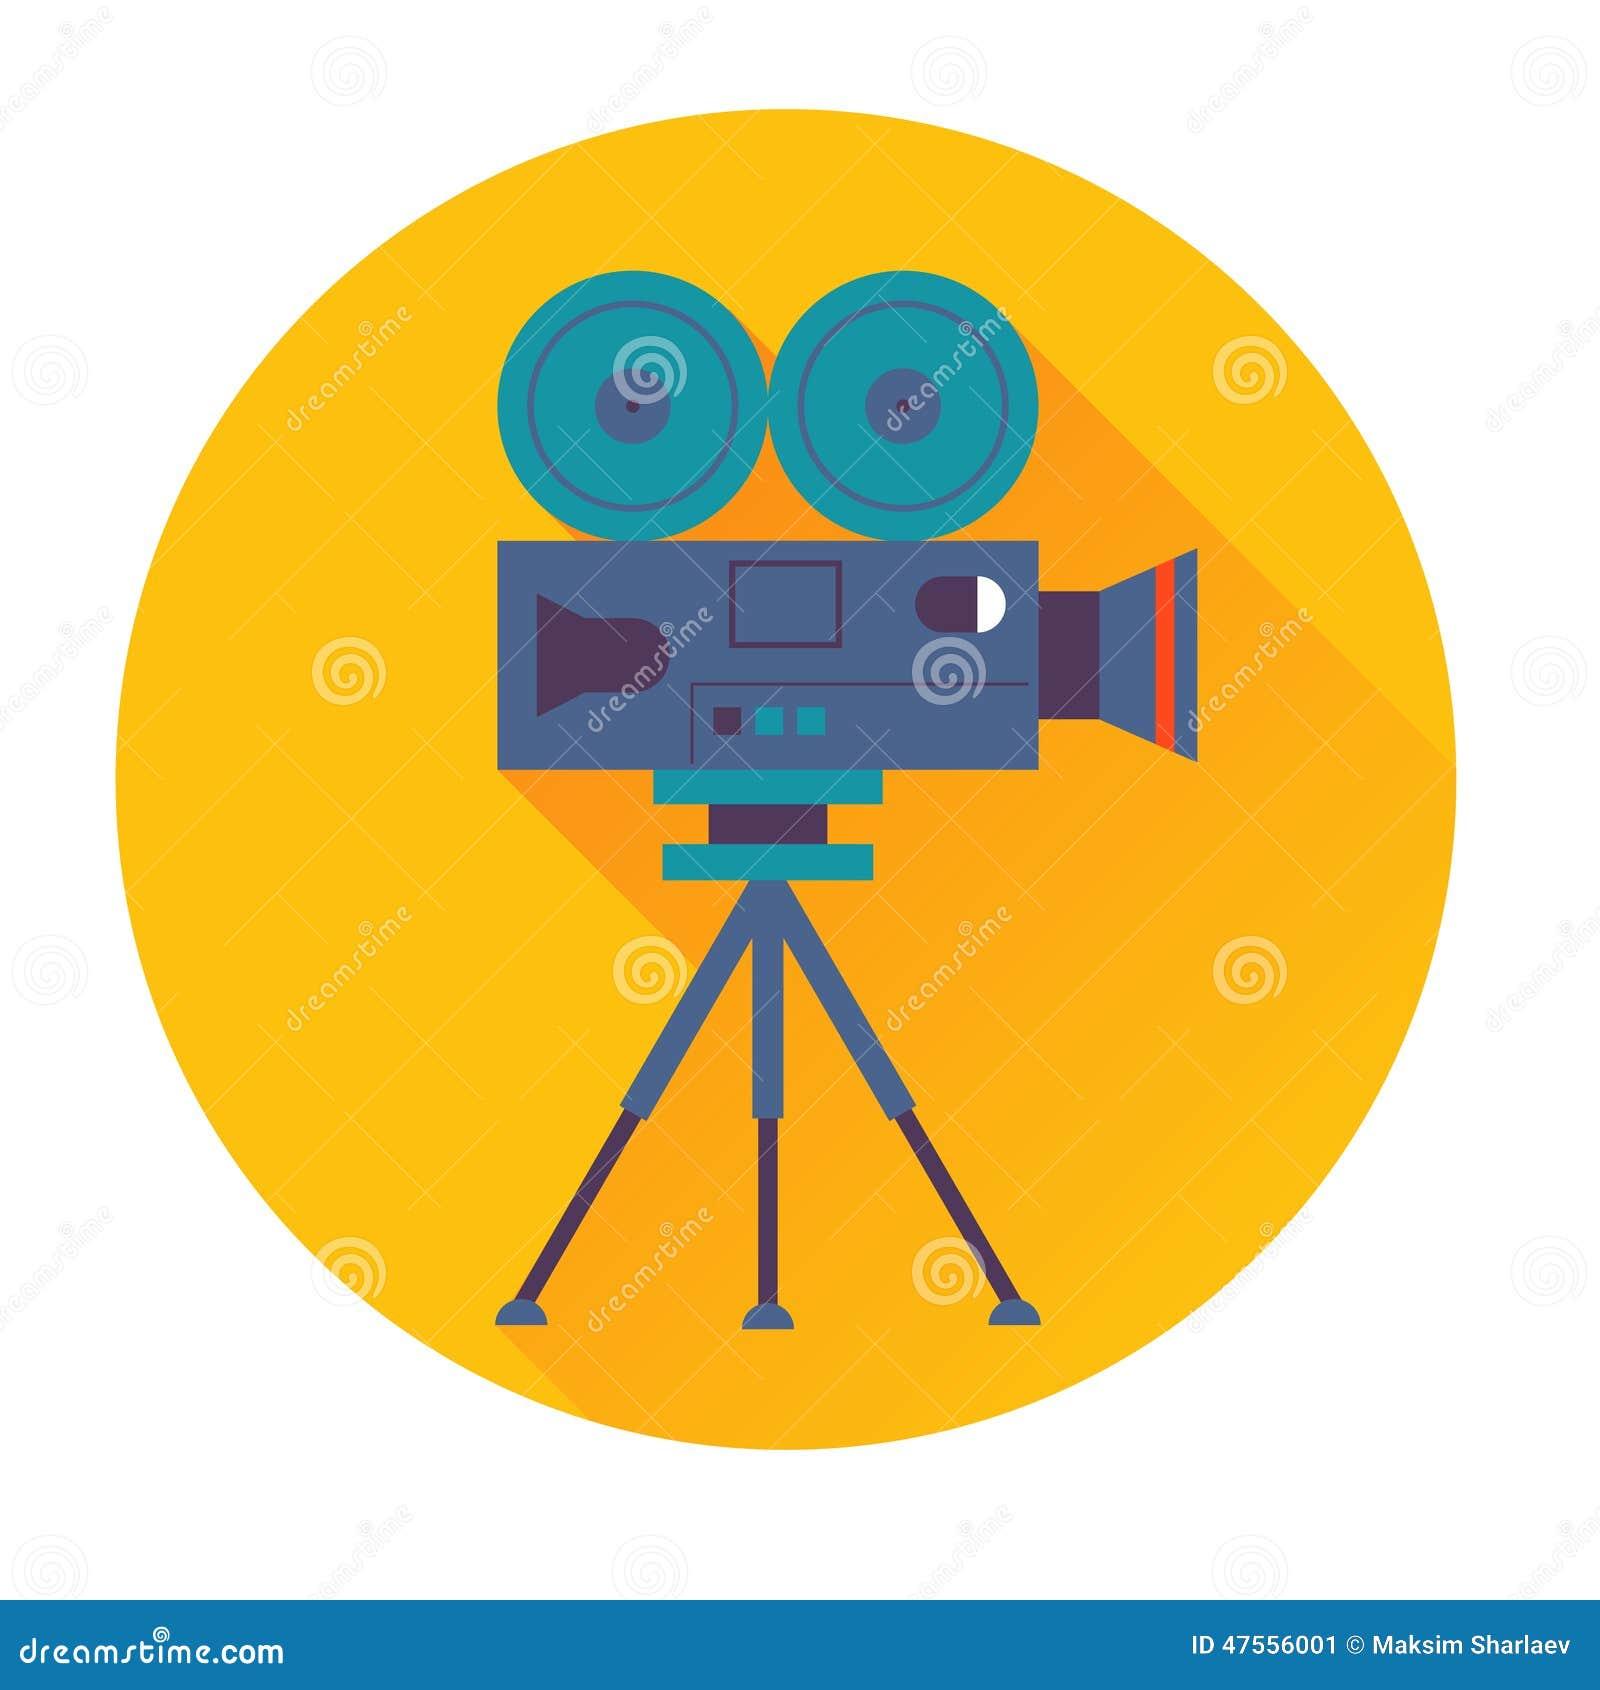 Cinema Camera Icon Stock Vector Illustration Of Lens 47556001